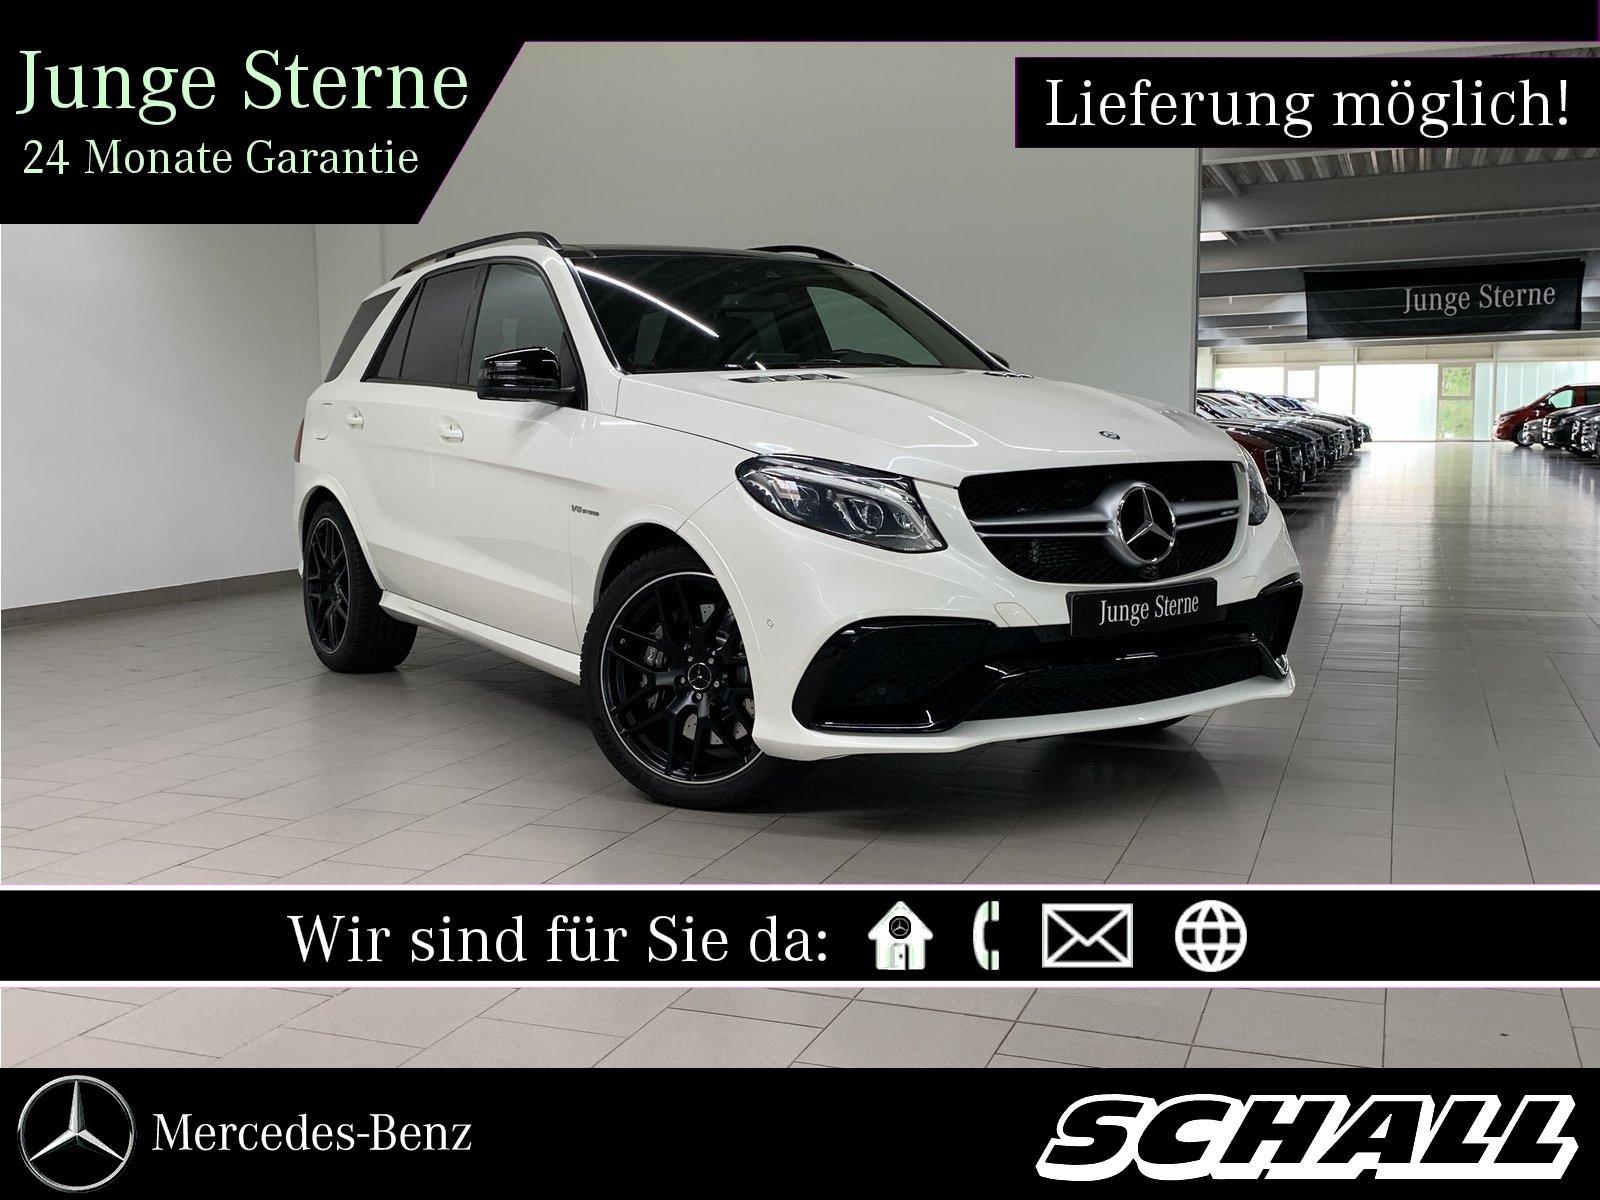 "Mercedes-Benz GLE 63 AMG 4M NIGHT+ACTIVE CURVE+21""AMG+LED+360°, Jahr 2017, petrol"